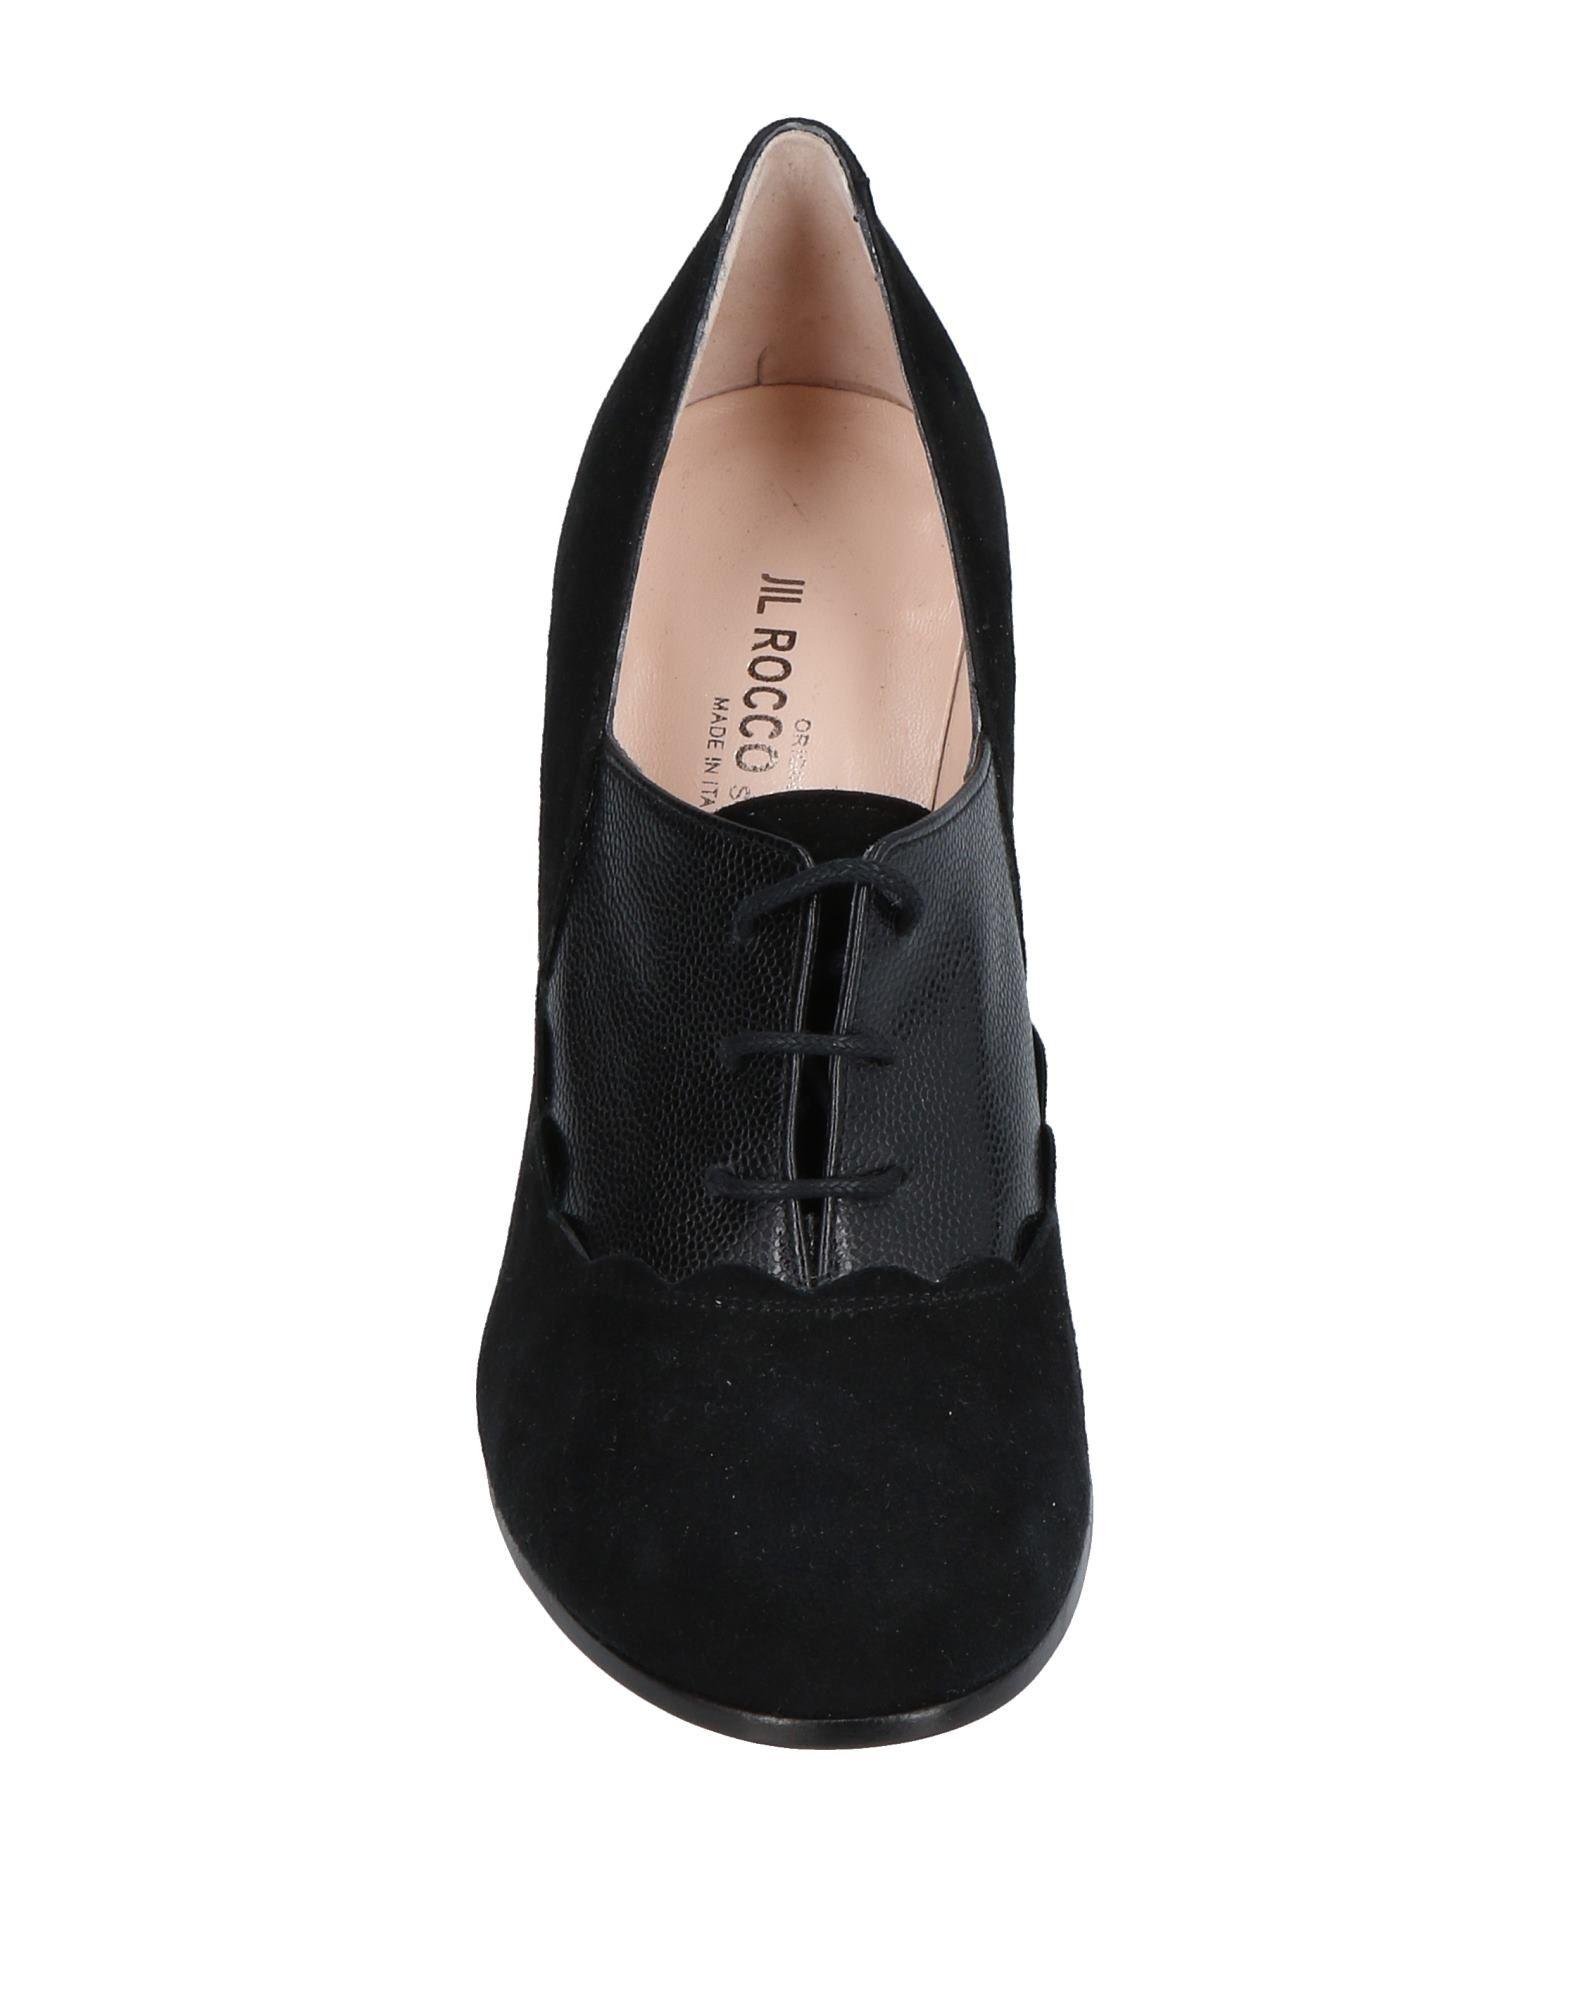 Gut um billige Schuhe zu tragenJil tragenJil tragenJil Rocco Schnürschuhe Damen  11462164XU 2c13cb